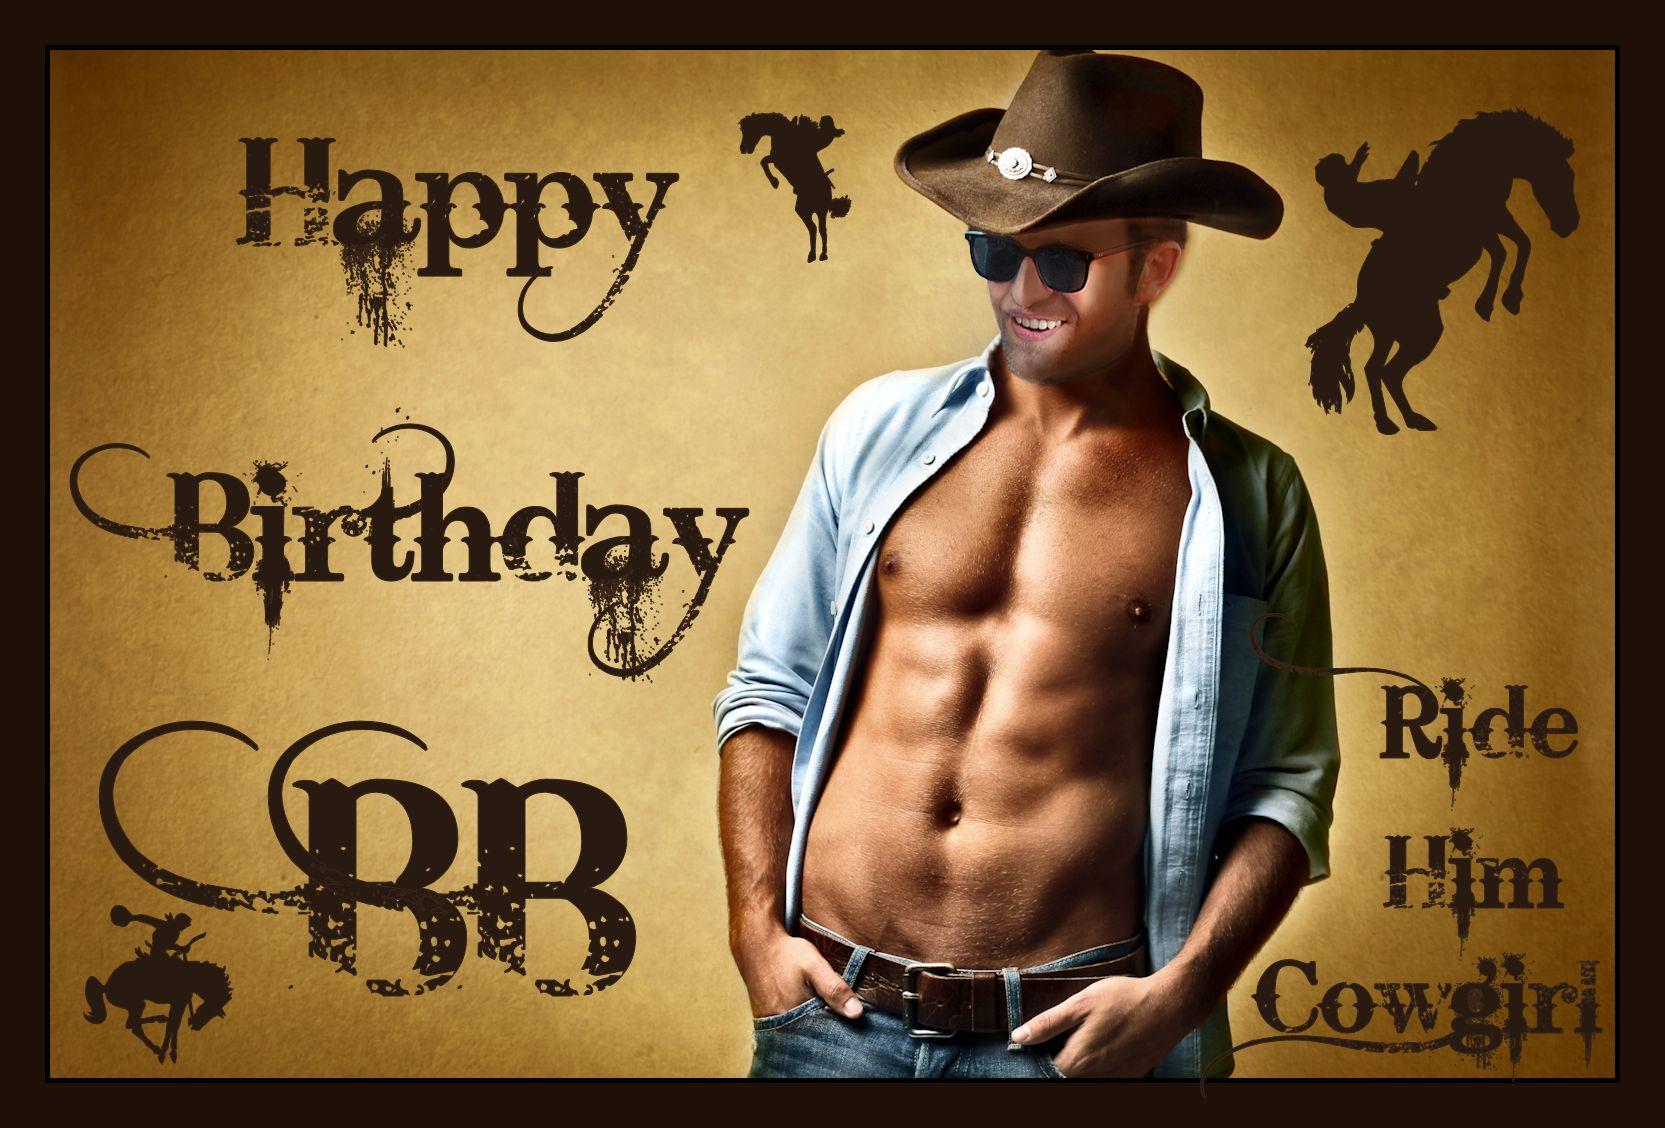 Happy Birthday Rob Attack